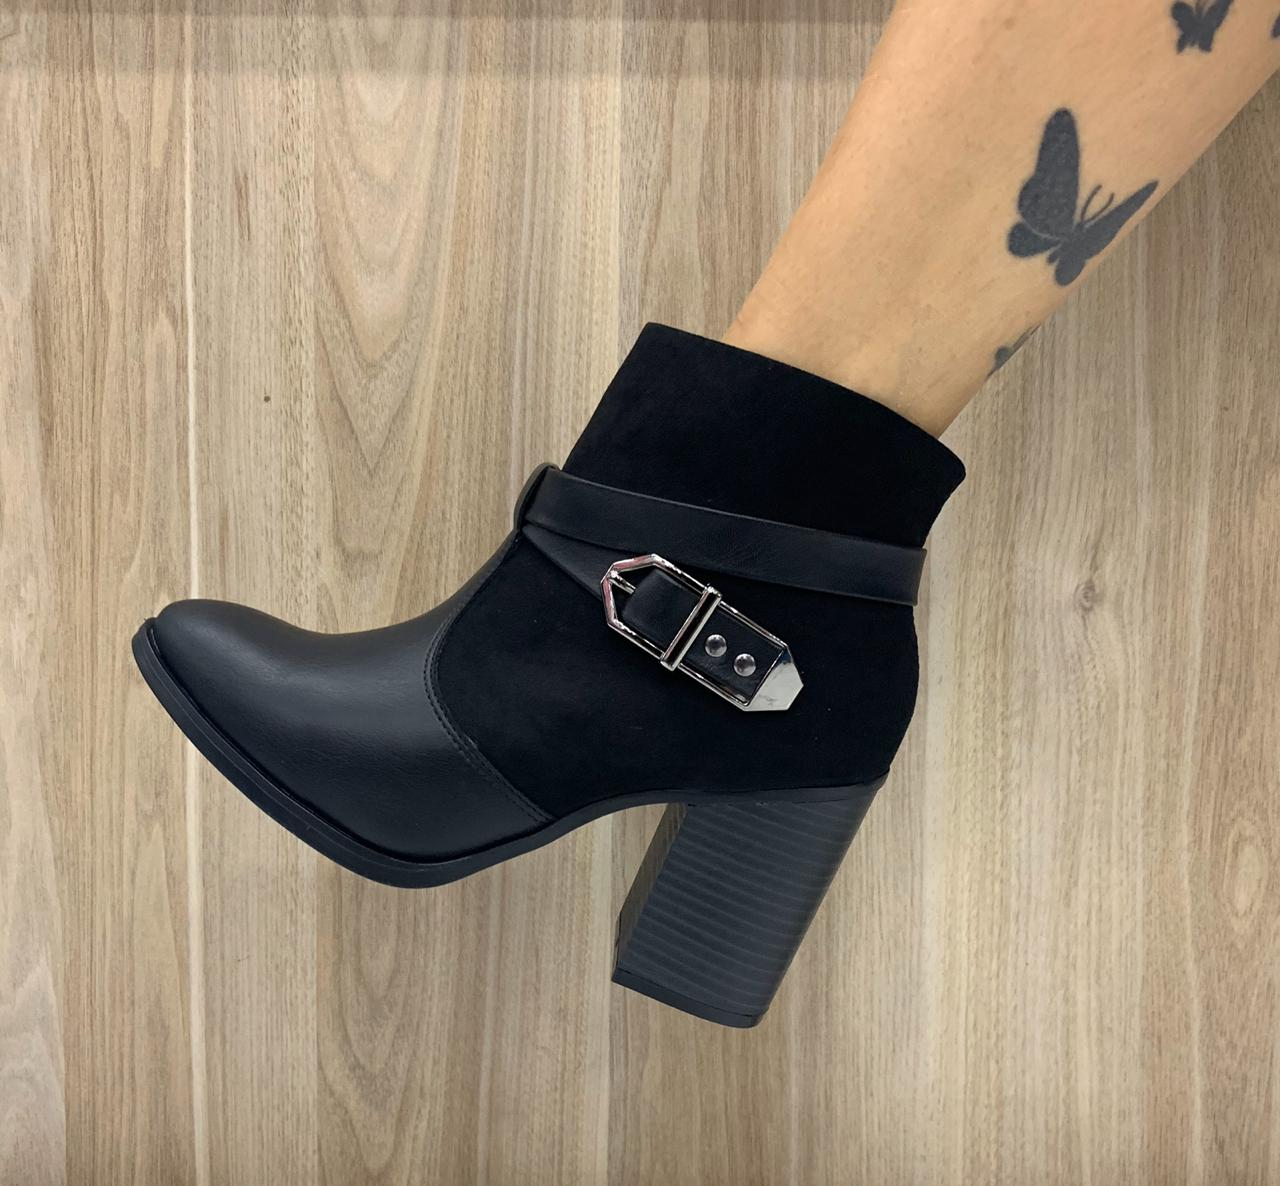 Bota Ramarim Ankle Boot Salto Grosso Cano Curto 1916101 Feminina